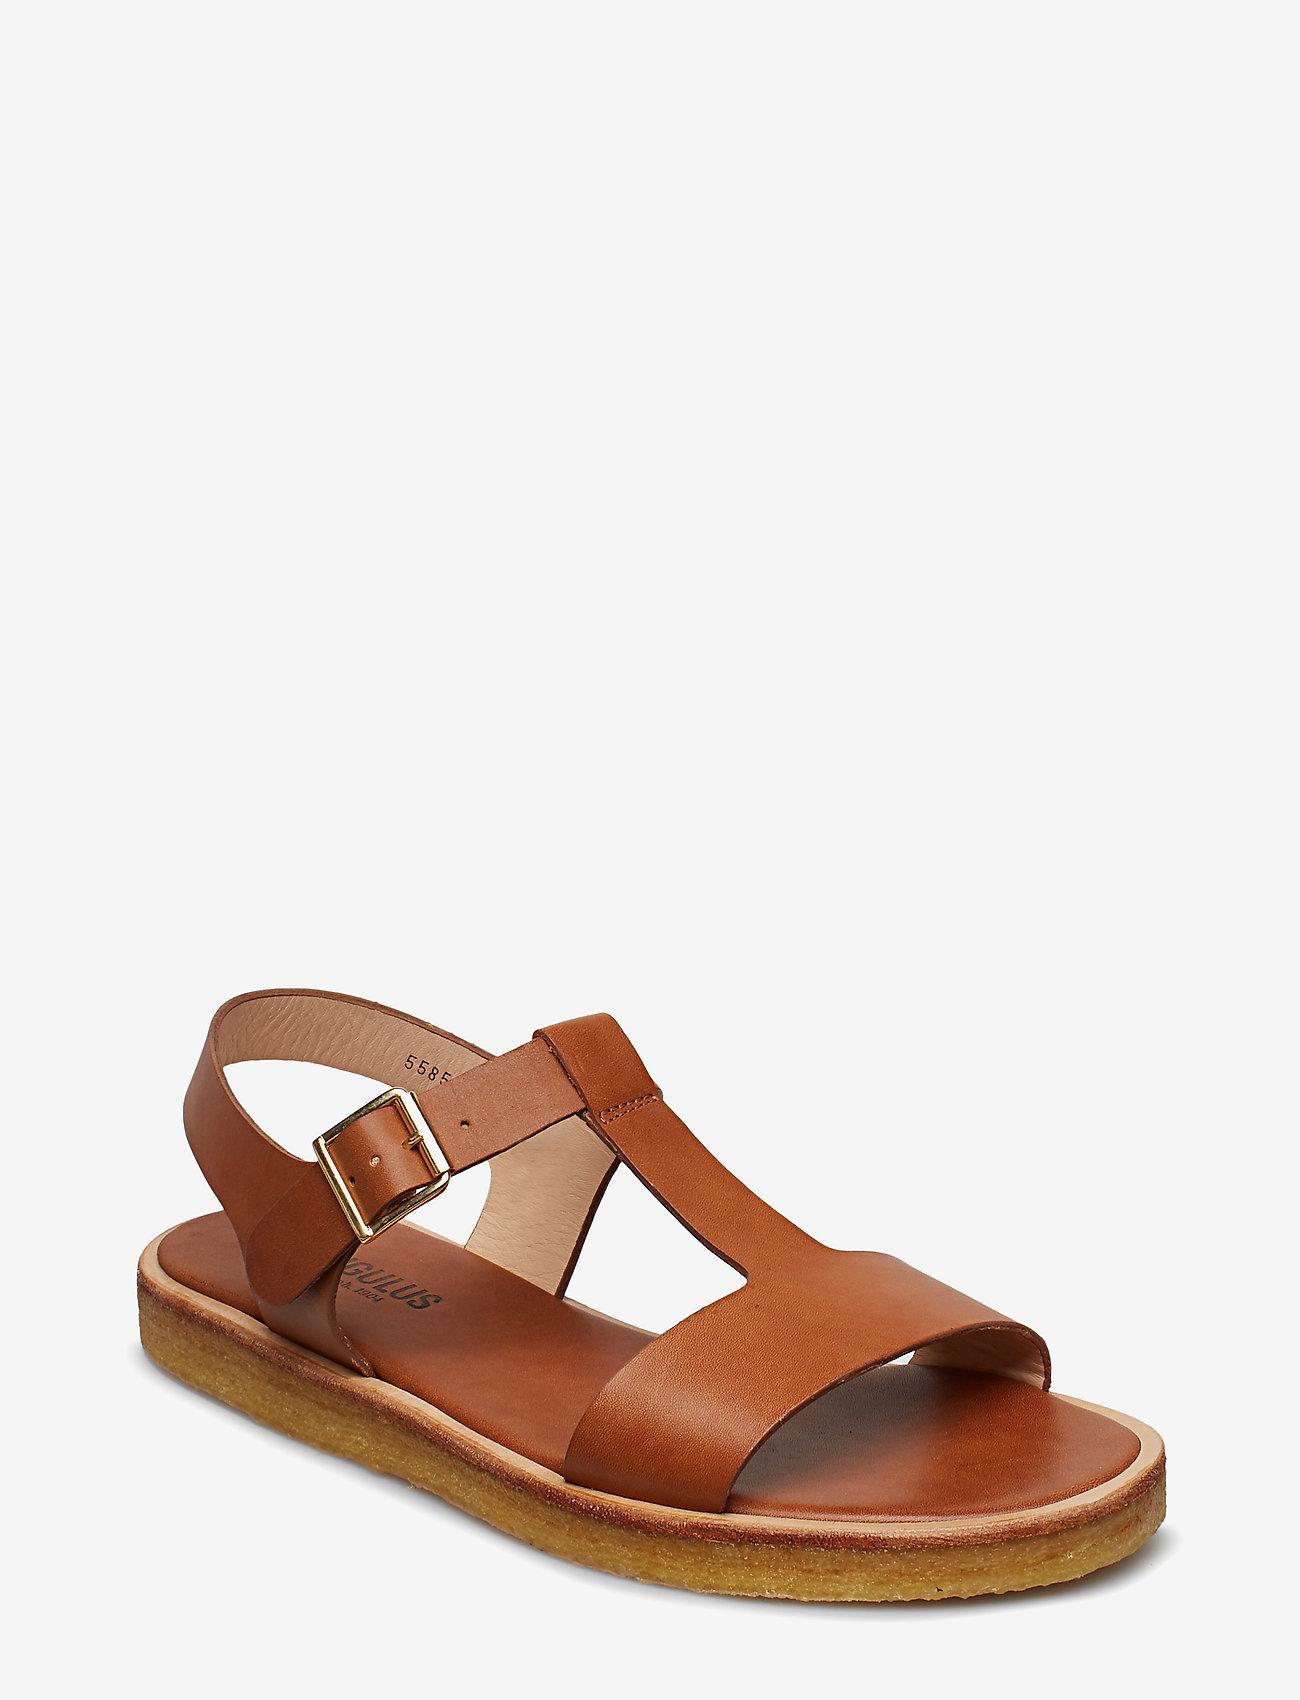 ANGULUS - Sandals - flat - open toe - op - flache sandalen - 1789 tan - 0